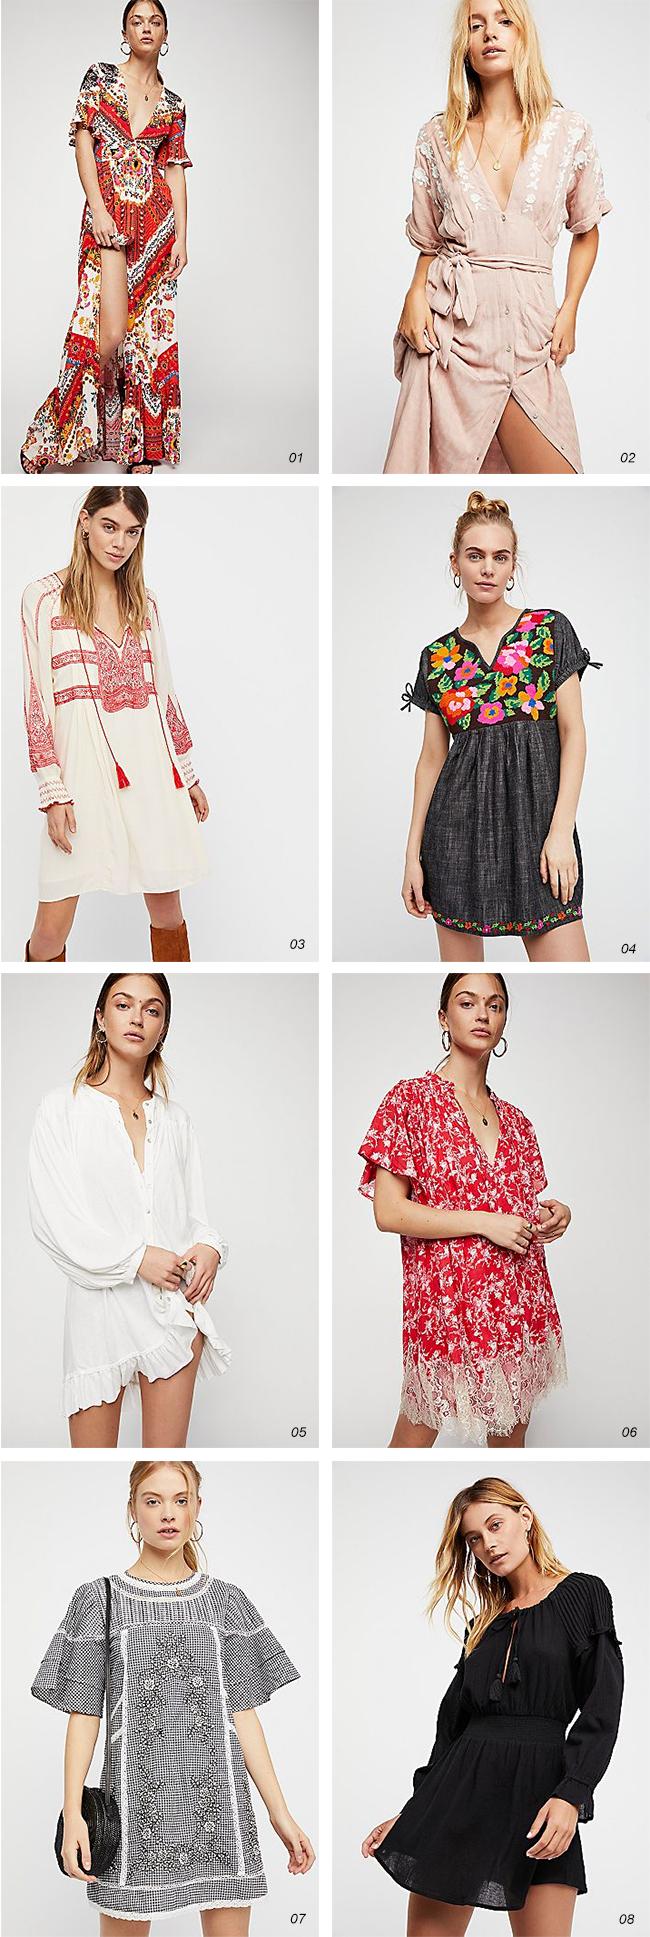 8 Gorgeous Springtime Dresses